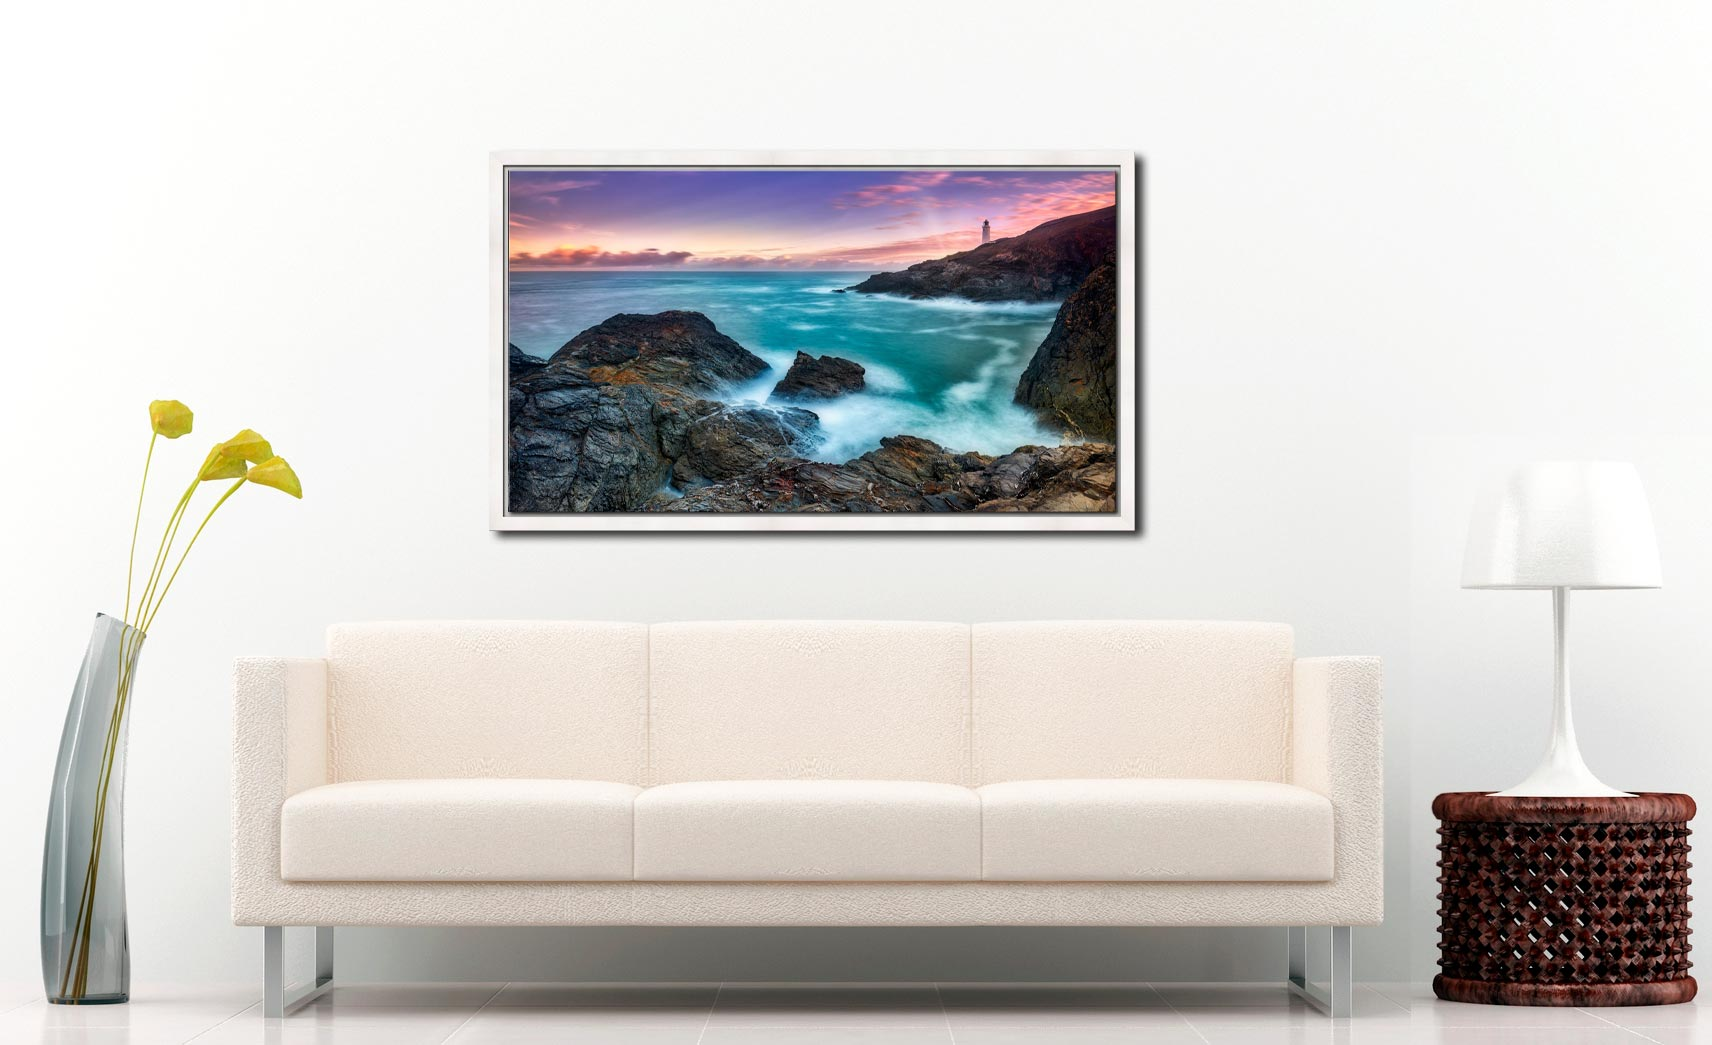 Stinking Cove Trevose Head Sunrise - White Maple floater frame with acrylic glazing on Wall